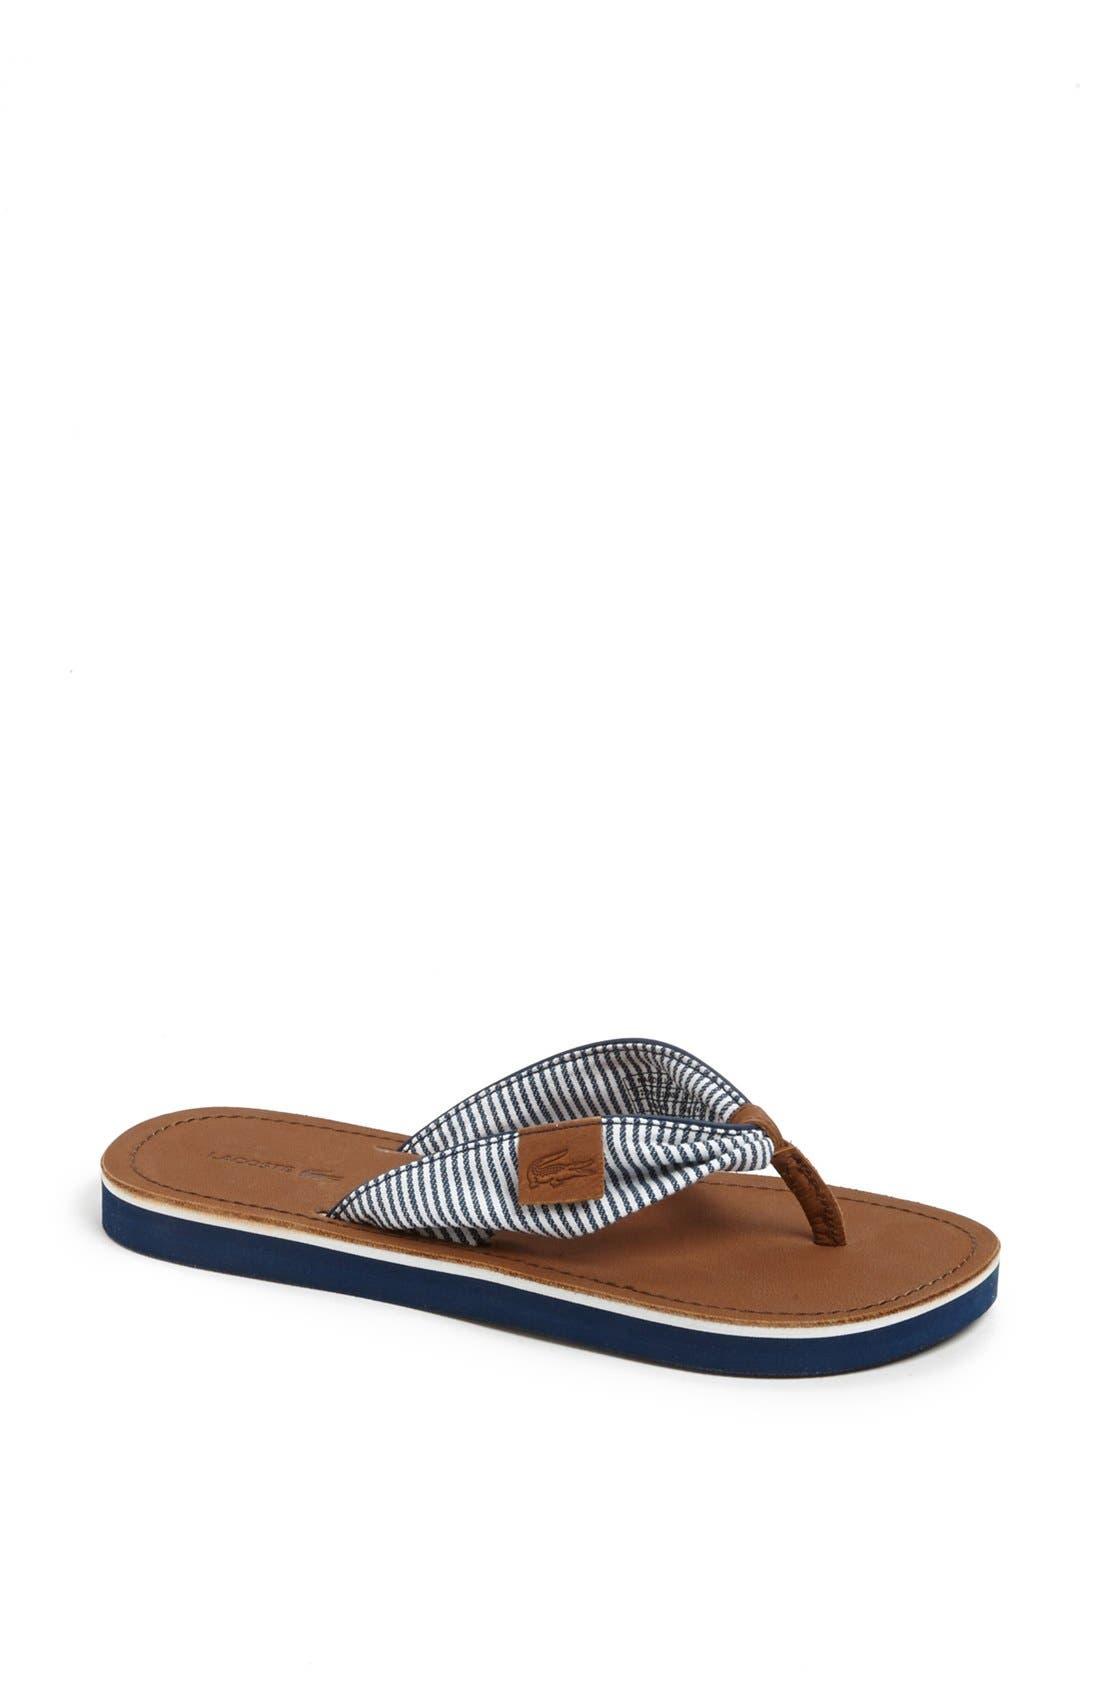 Alternate Image 1 Selected - Lacoste 'Maridell' Sandal